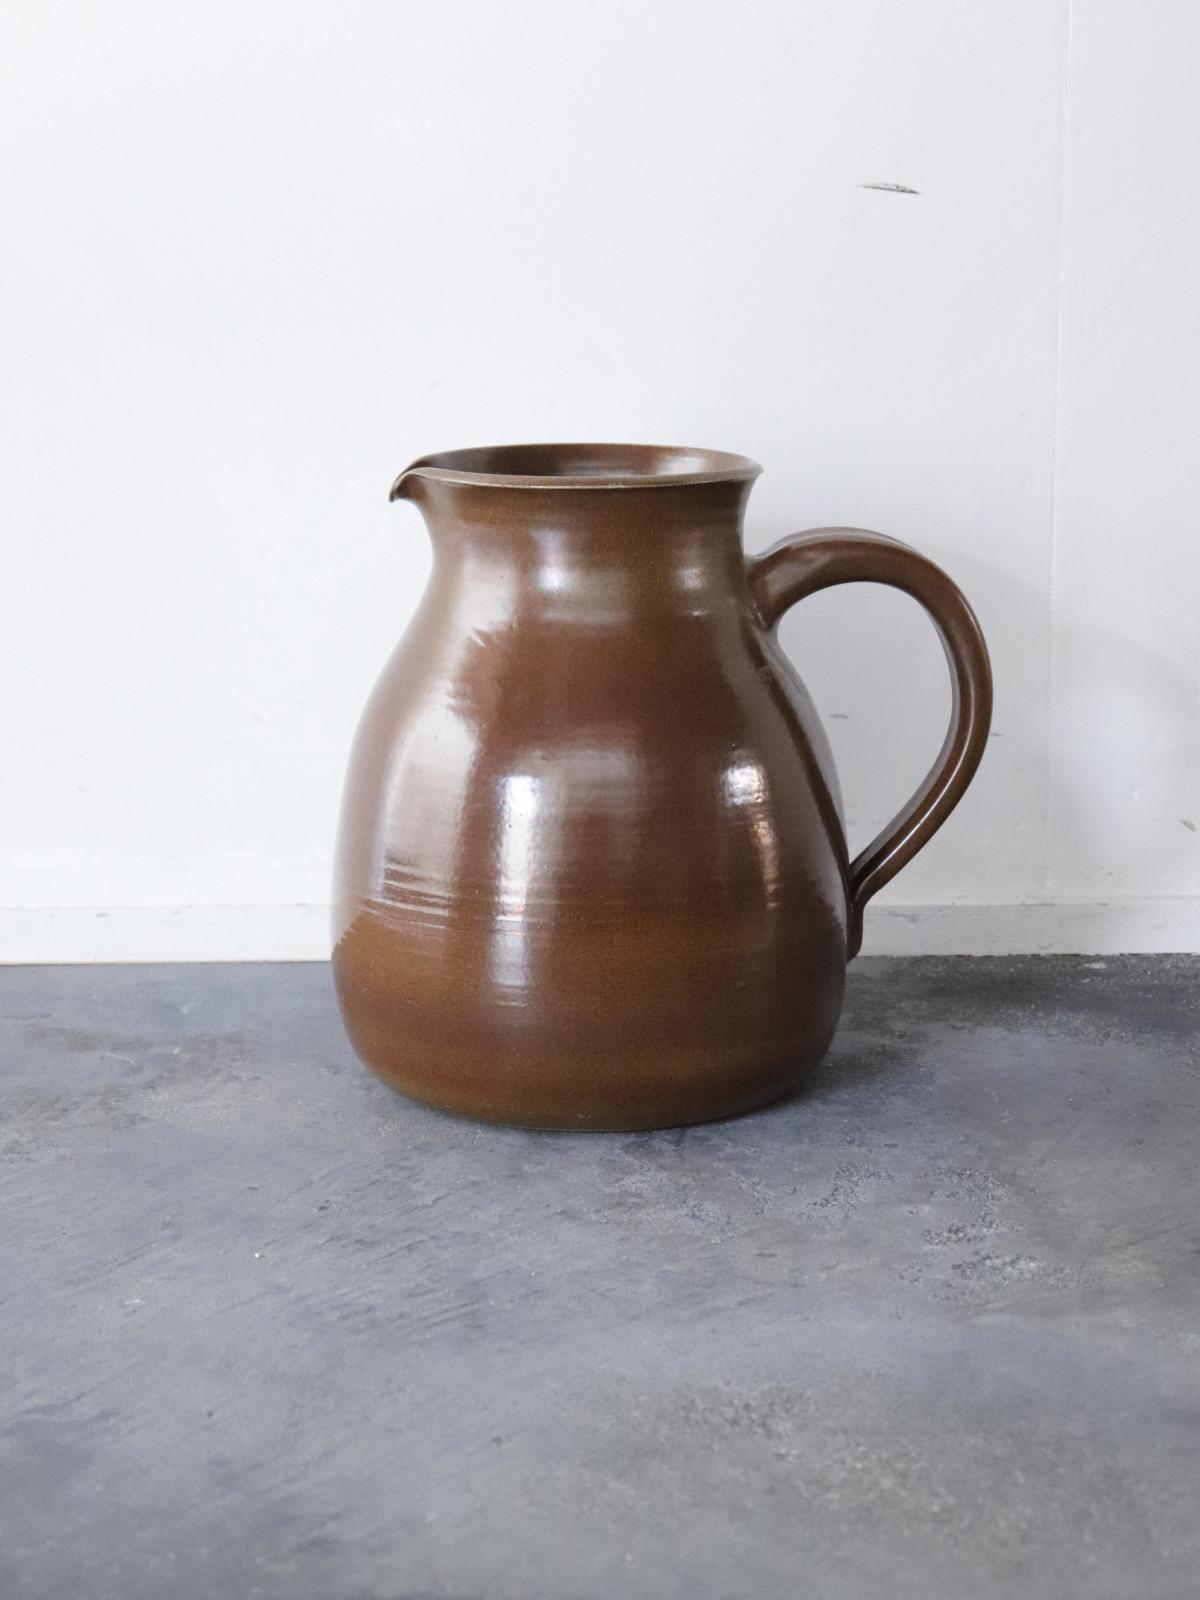 pitcher, Germany, Pottery,Dead stock